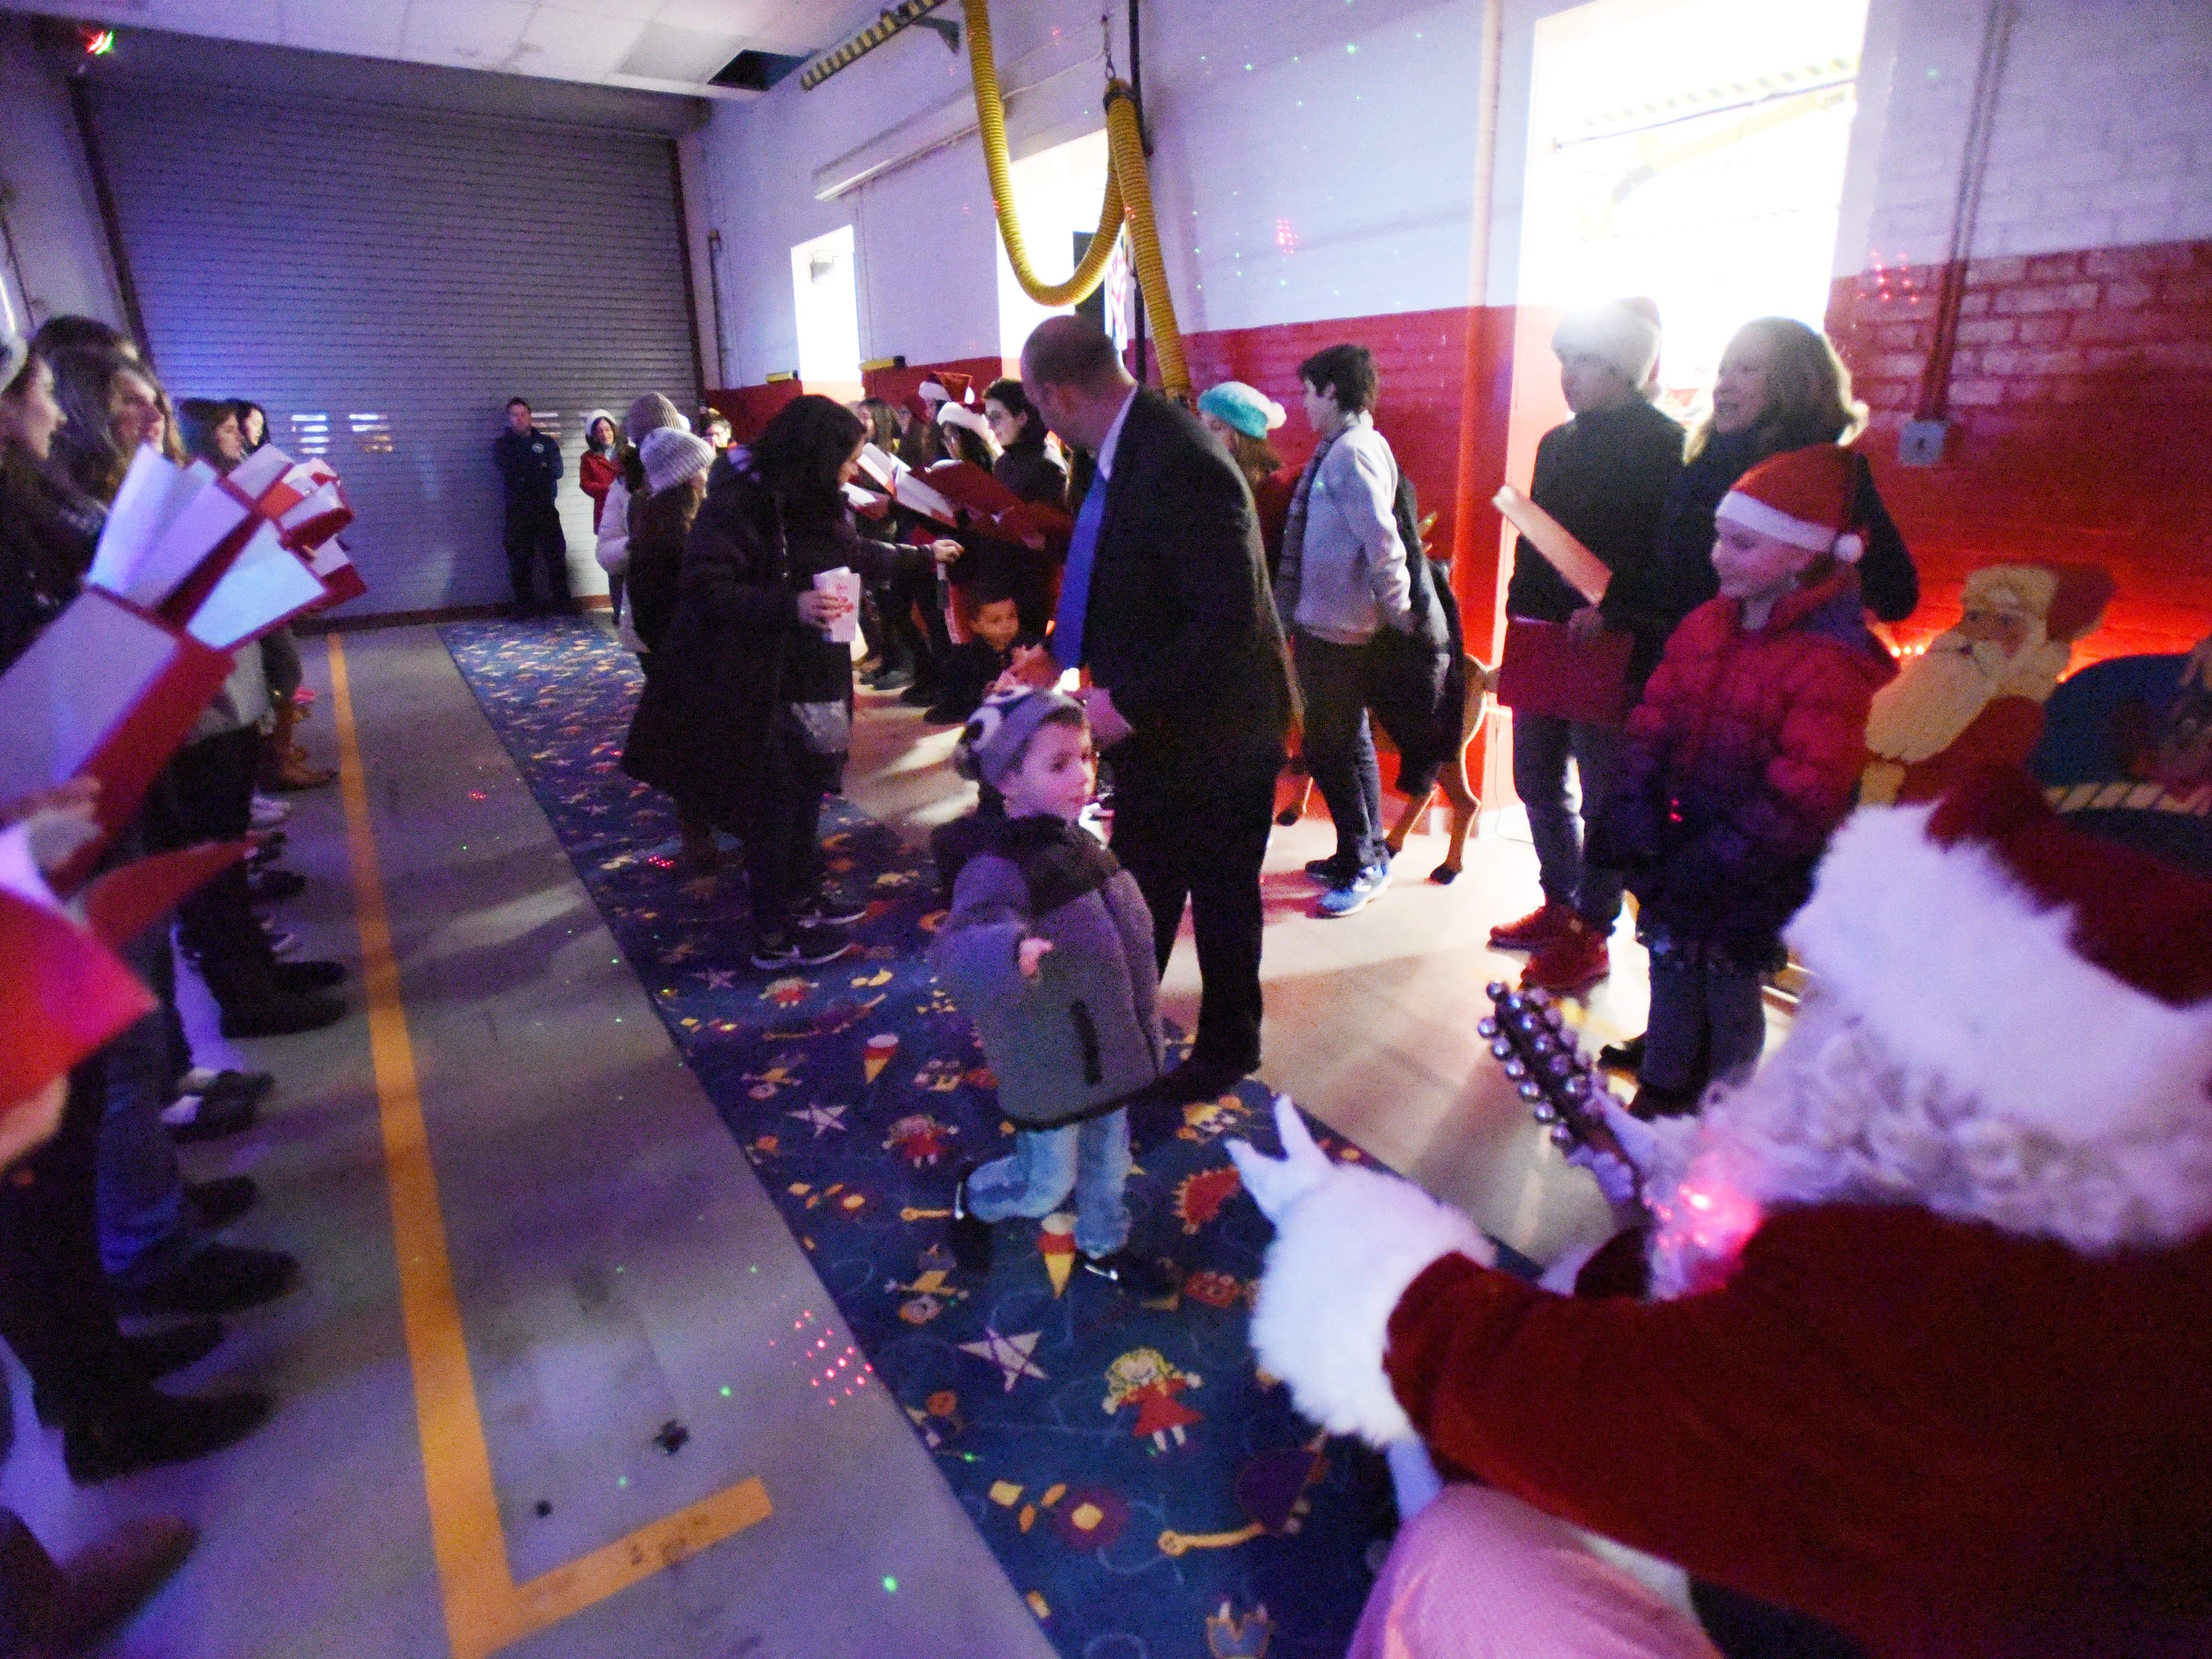 Preston Vargo (age 5) runs into the arms of Santa following the Christmas Tree Lighting ceremony at Cedar Grove Town Hall on 12/03/18.